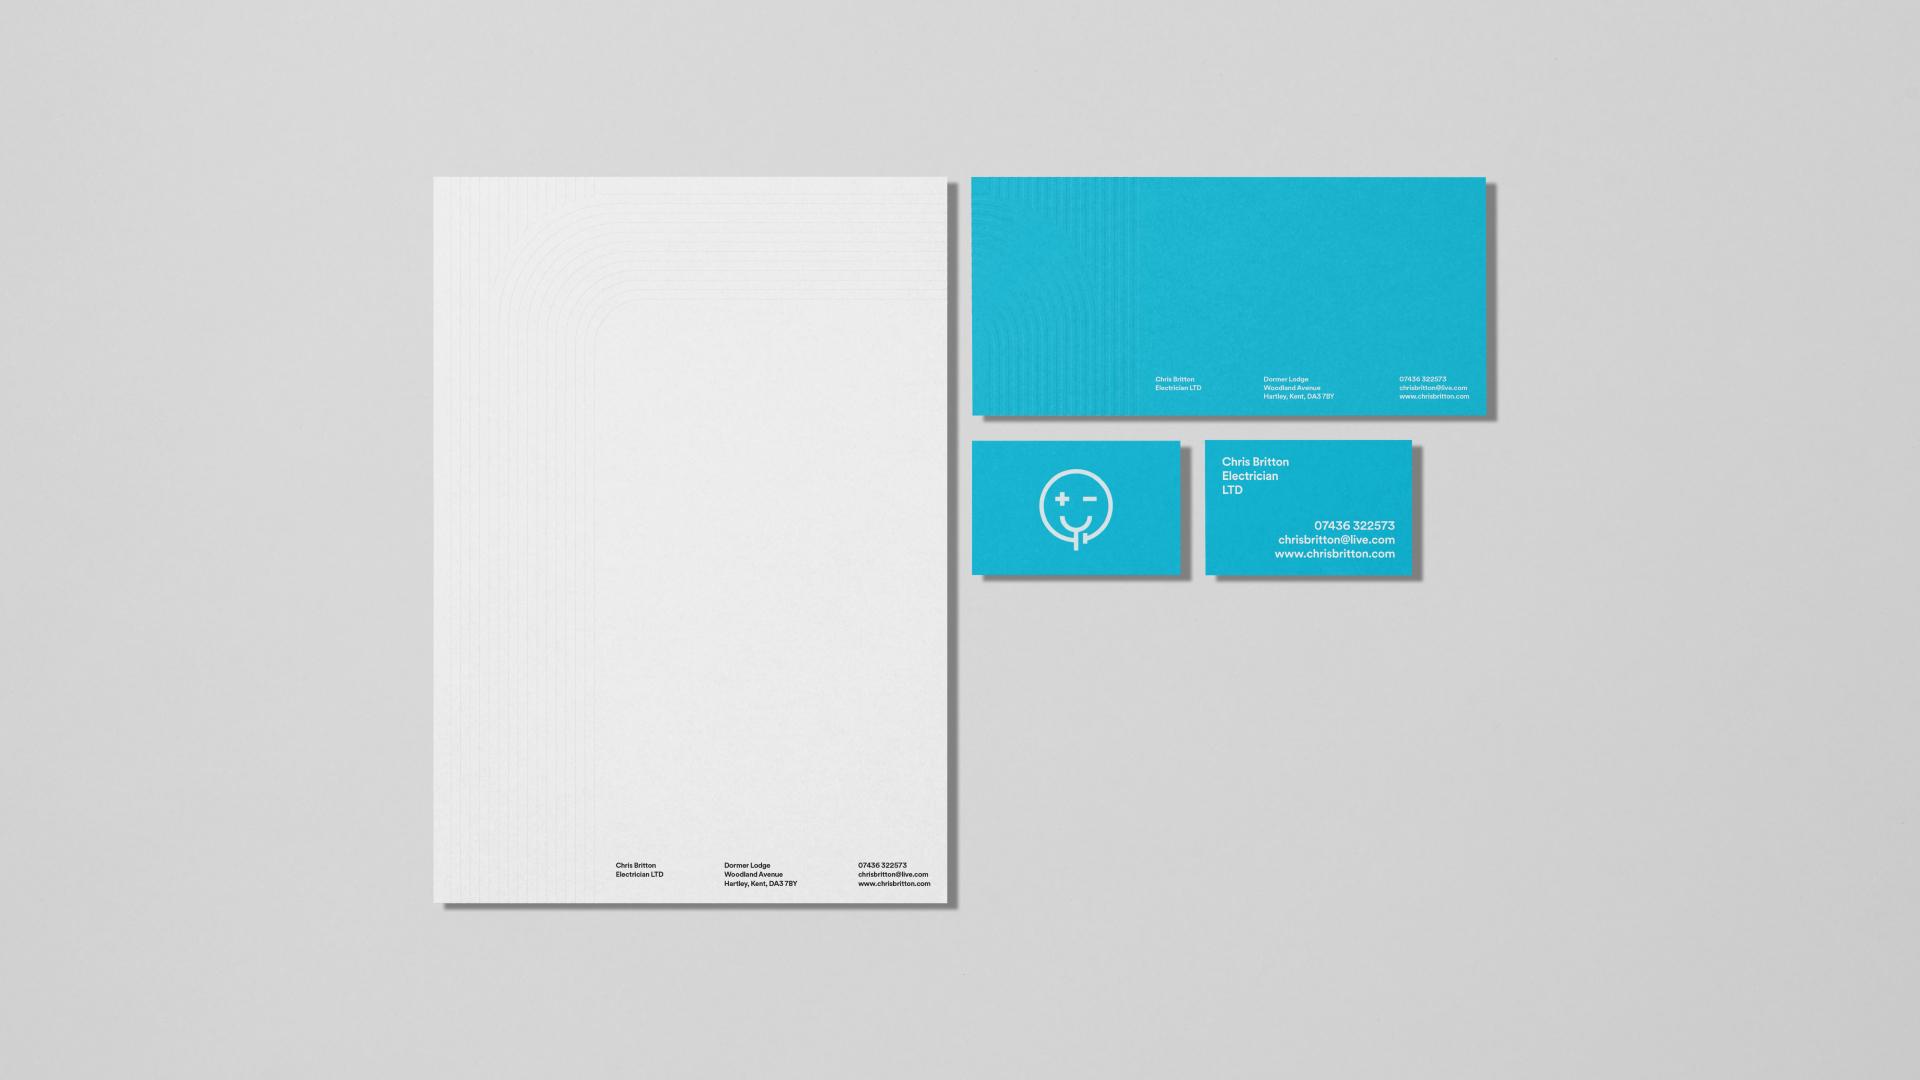 Chris_Britton_Electrician_Daniel_Britton_Applied_Branding_Website_Images_100820_4